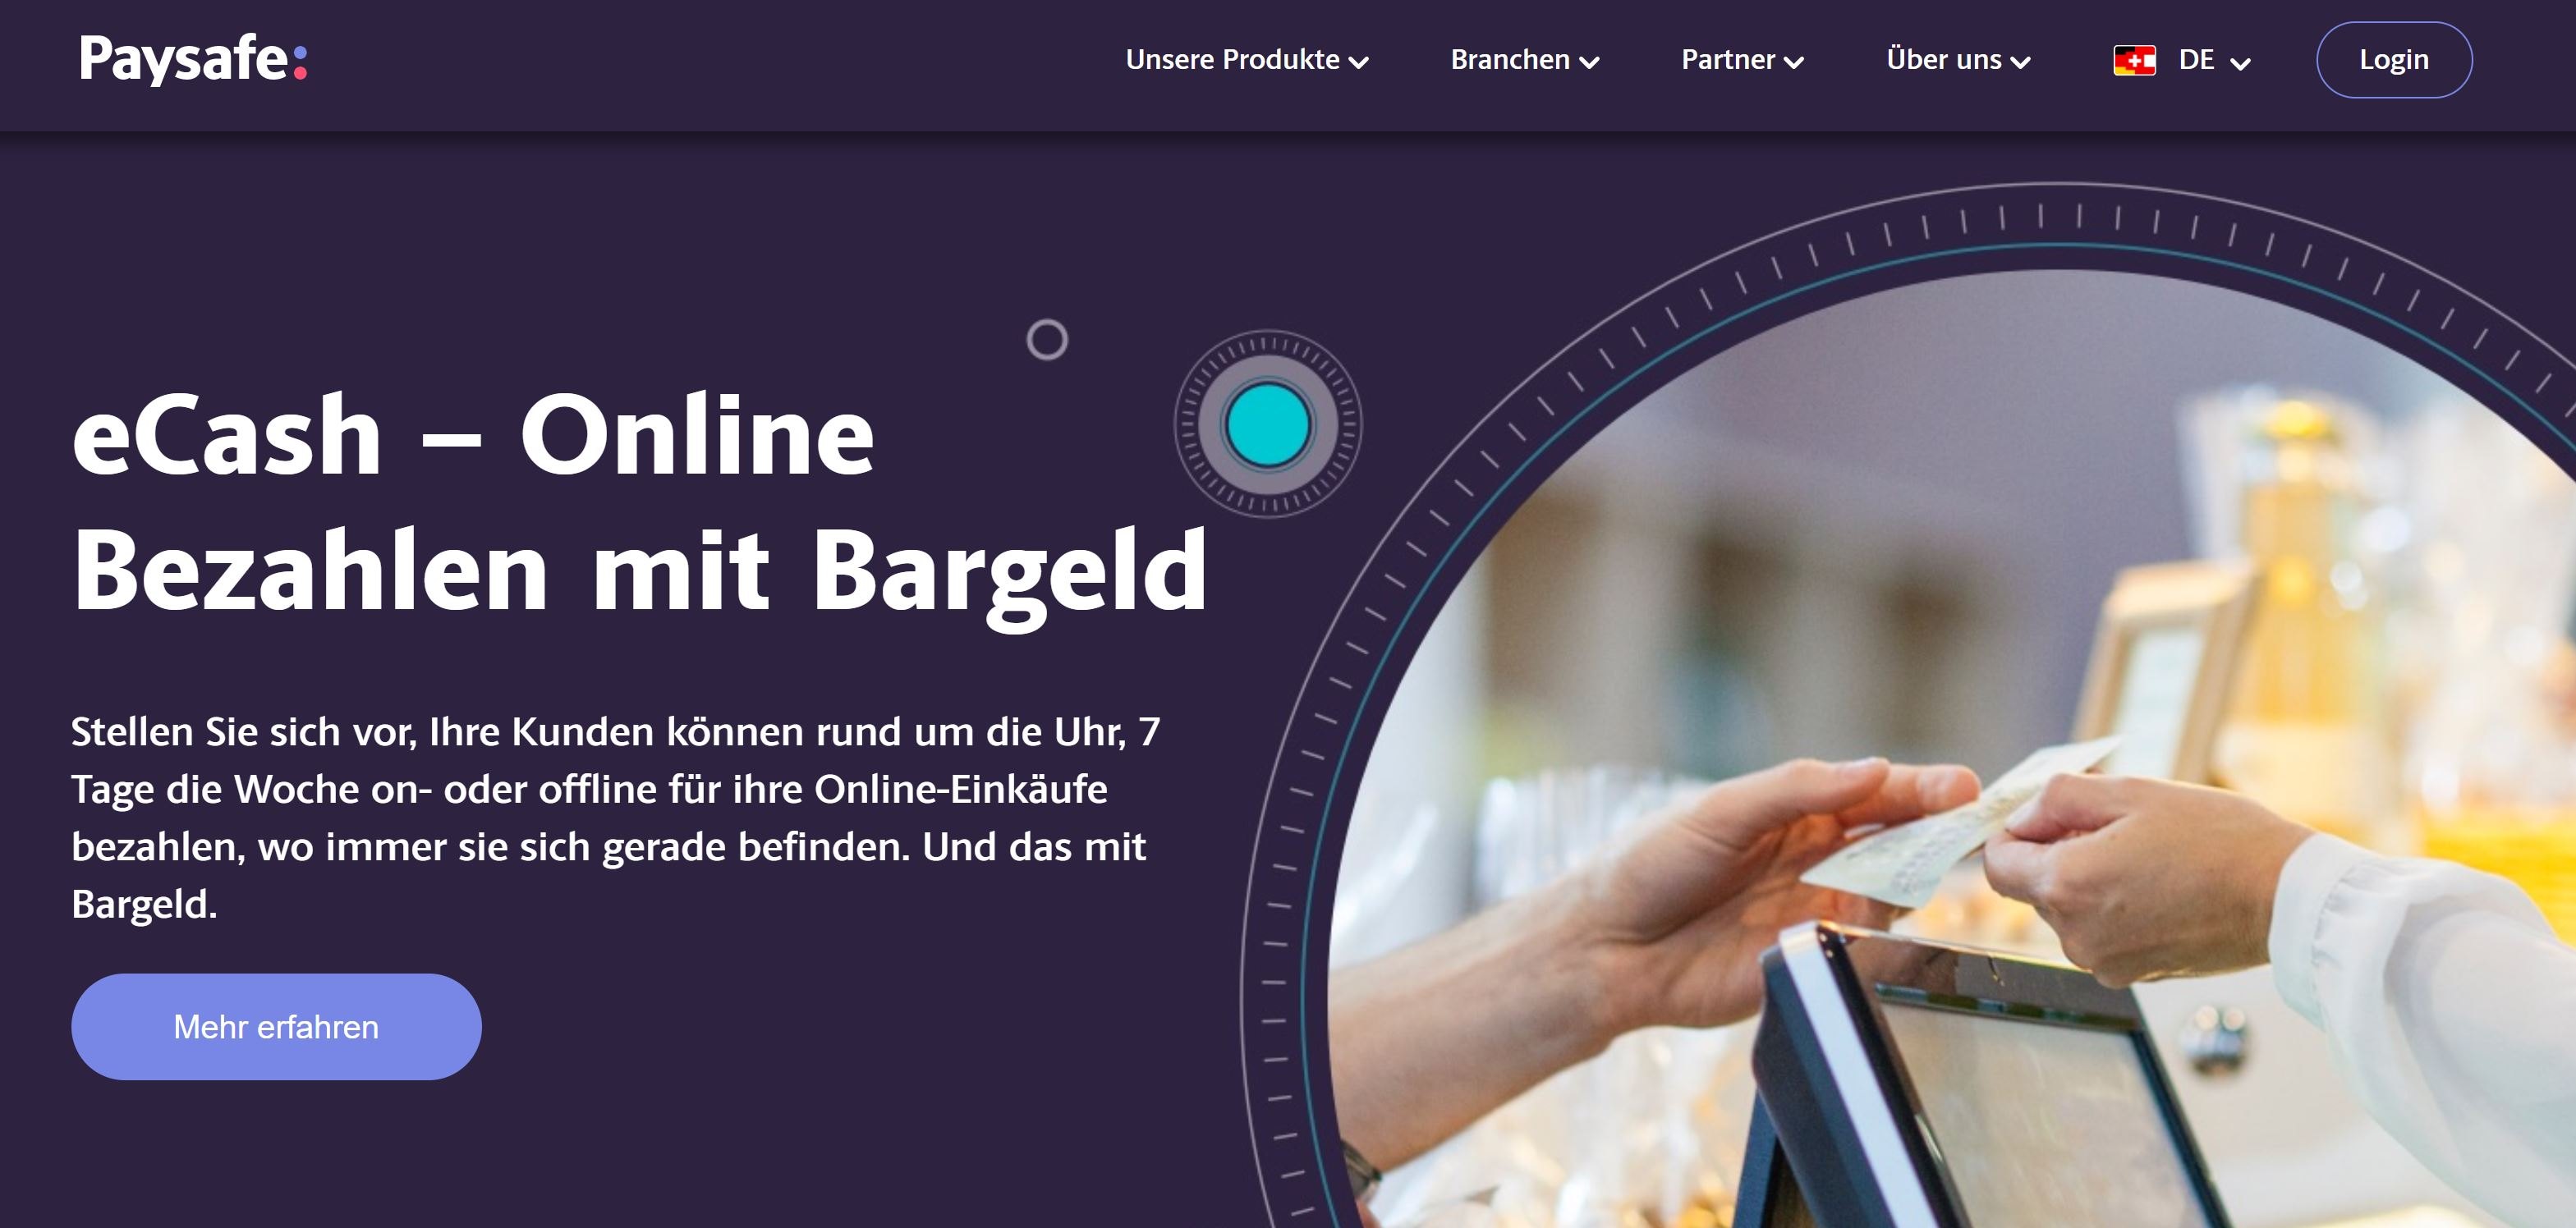 Веб-сайт и логотип Paysafe